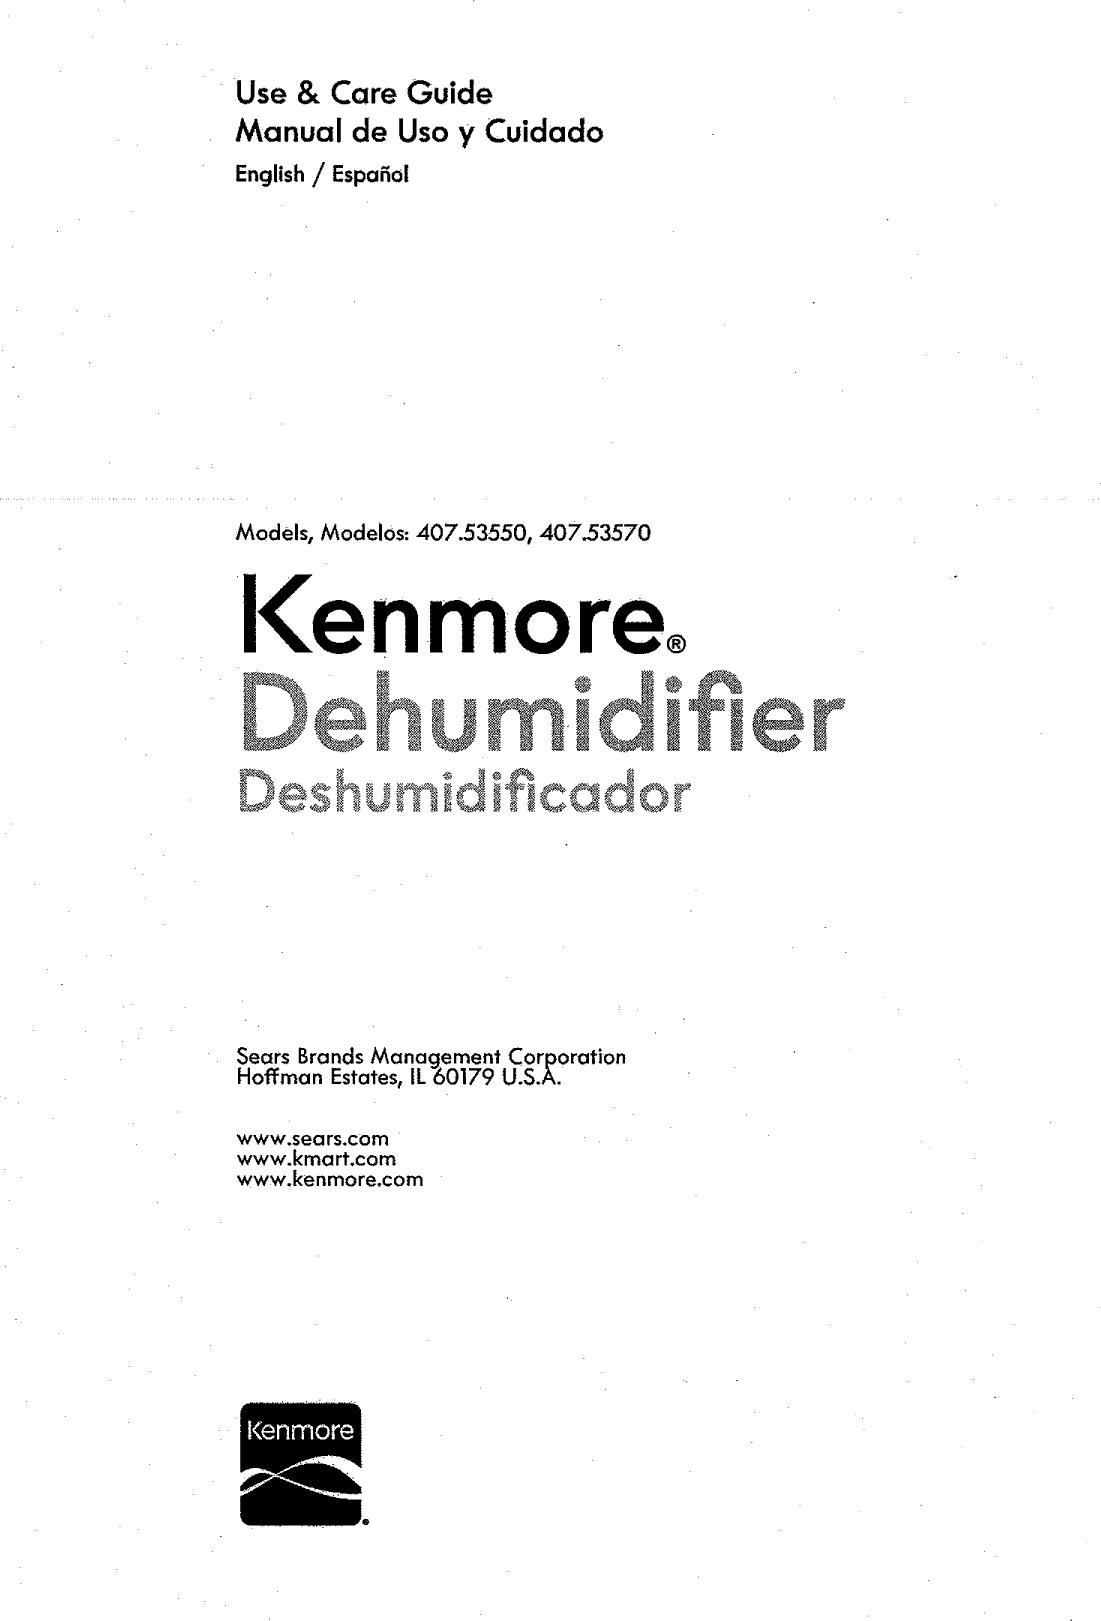 Kenmore 40753550310 User Manual 50 PINTS RATING LABEL Manuals And ...